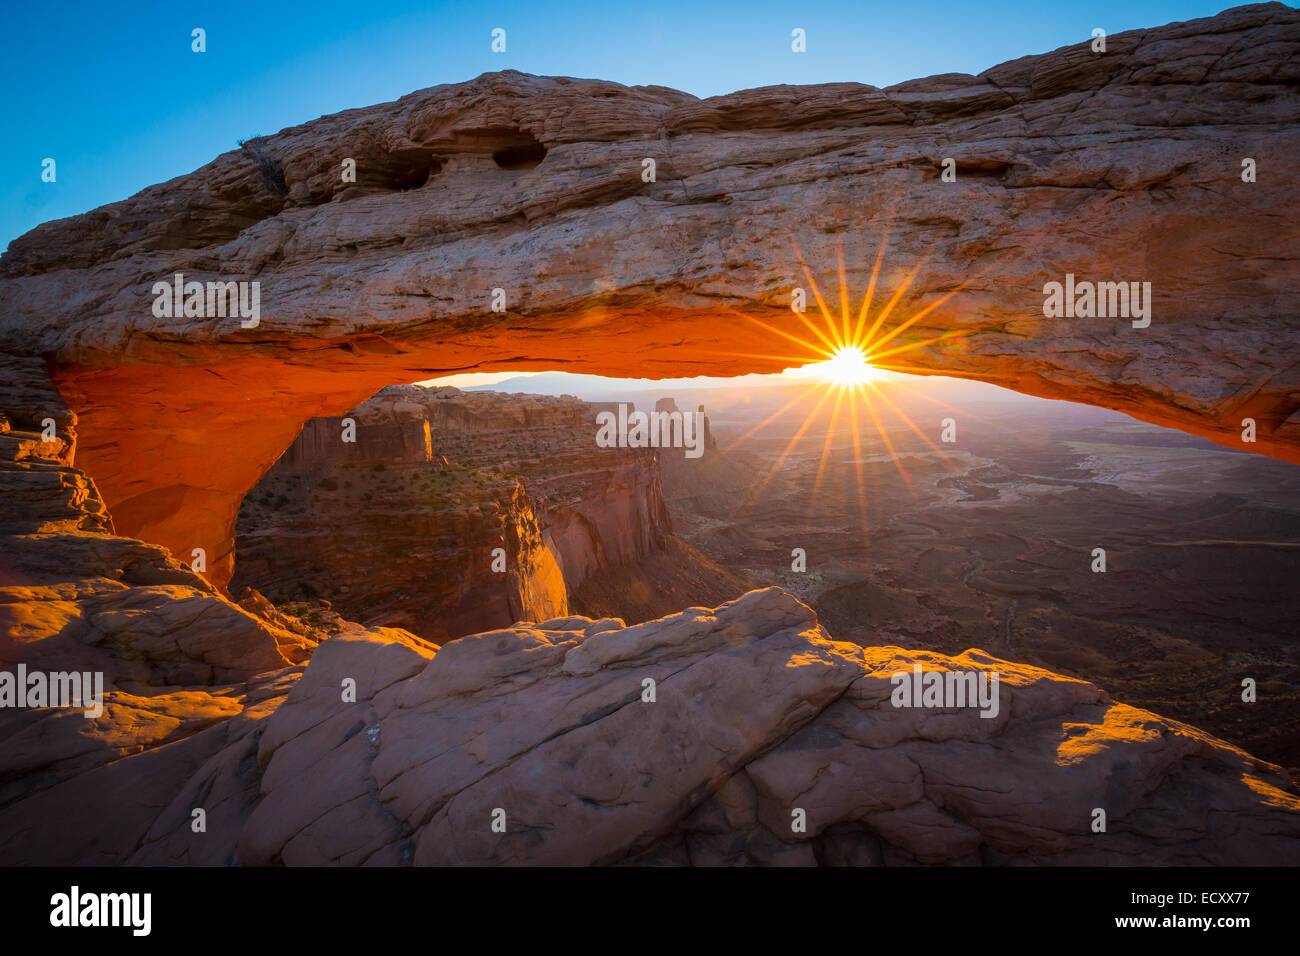 Mesa Arch bei Sonnenaufgang, Insel im Himmel Bezirk des Canyonlands National Park, Utah Stockbild